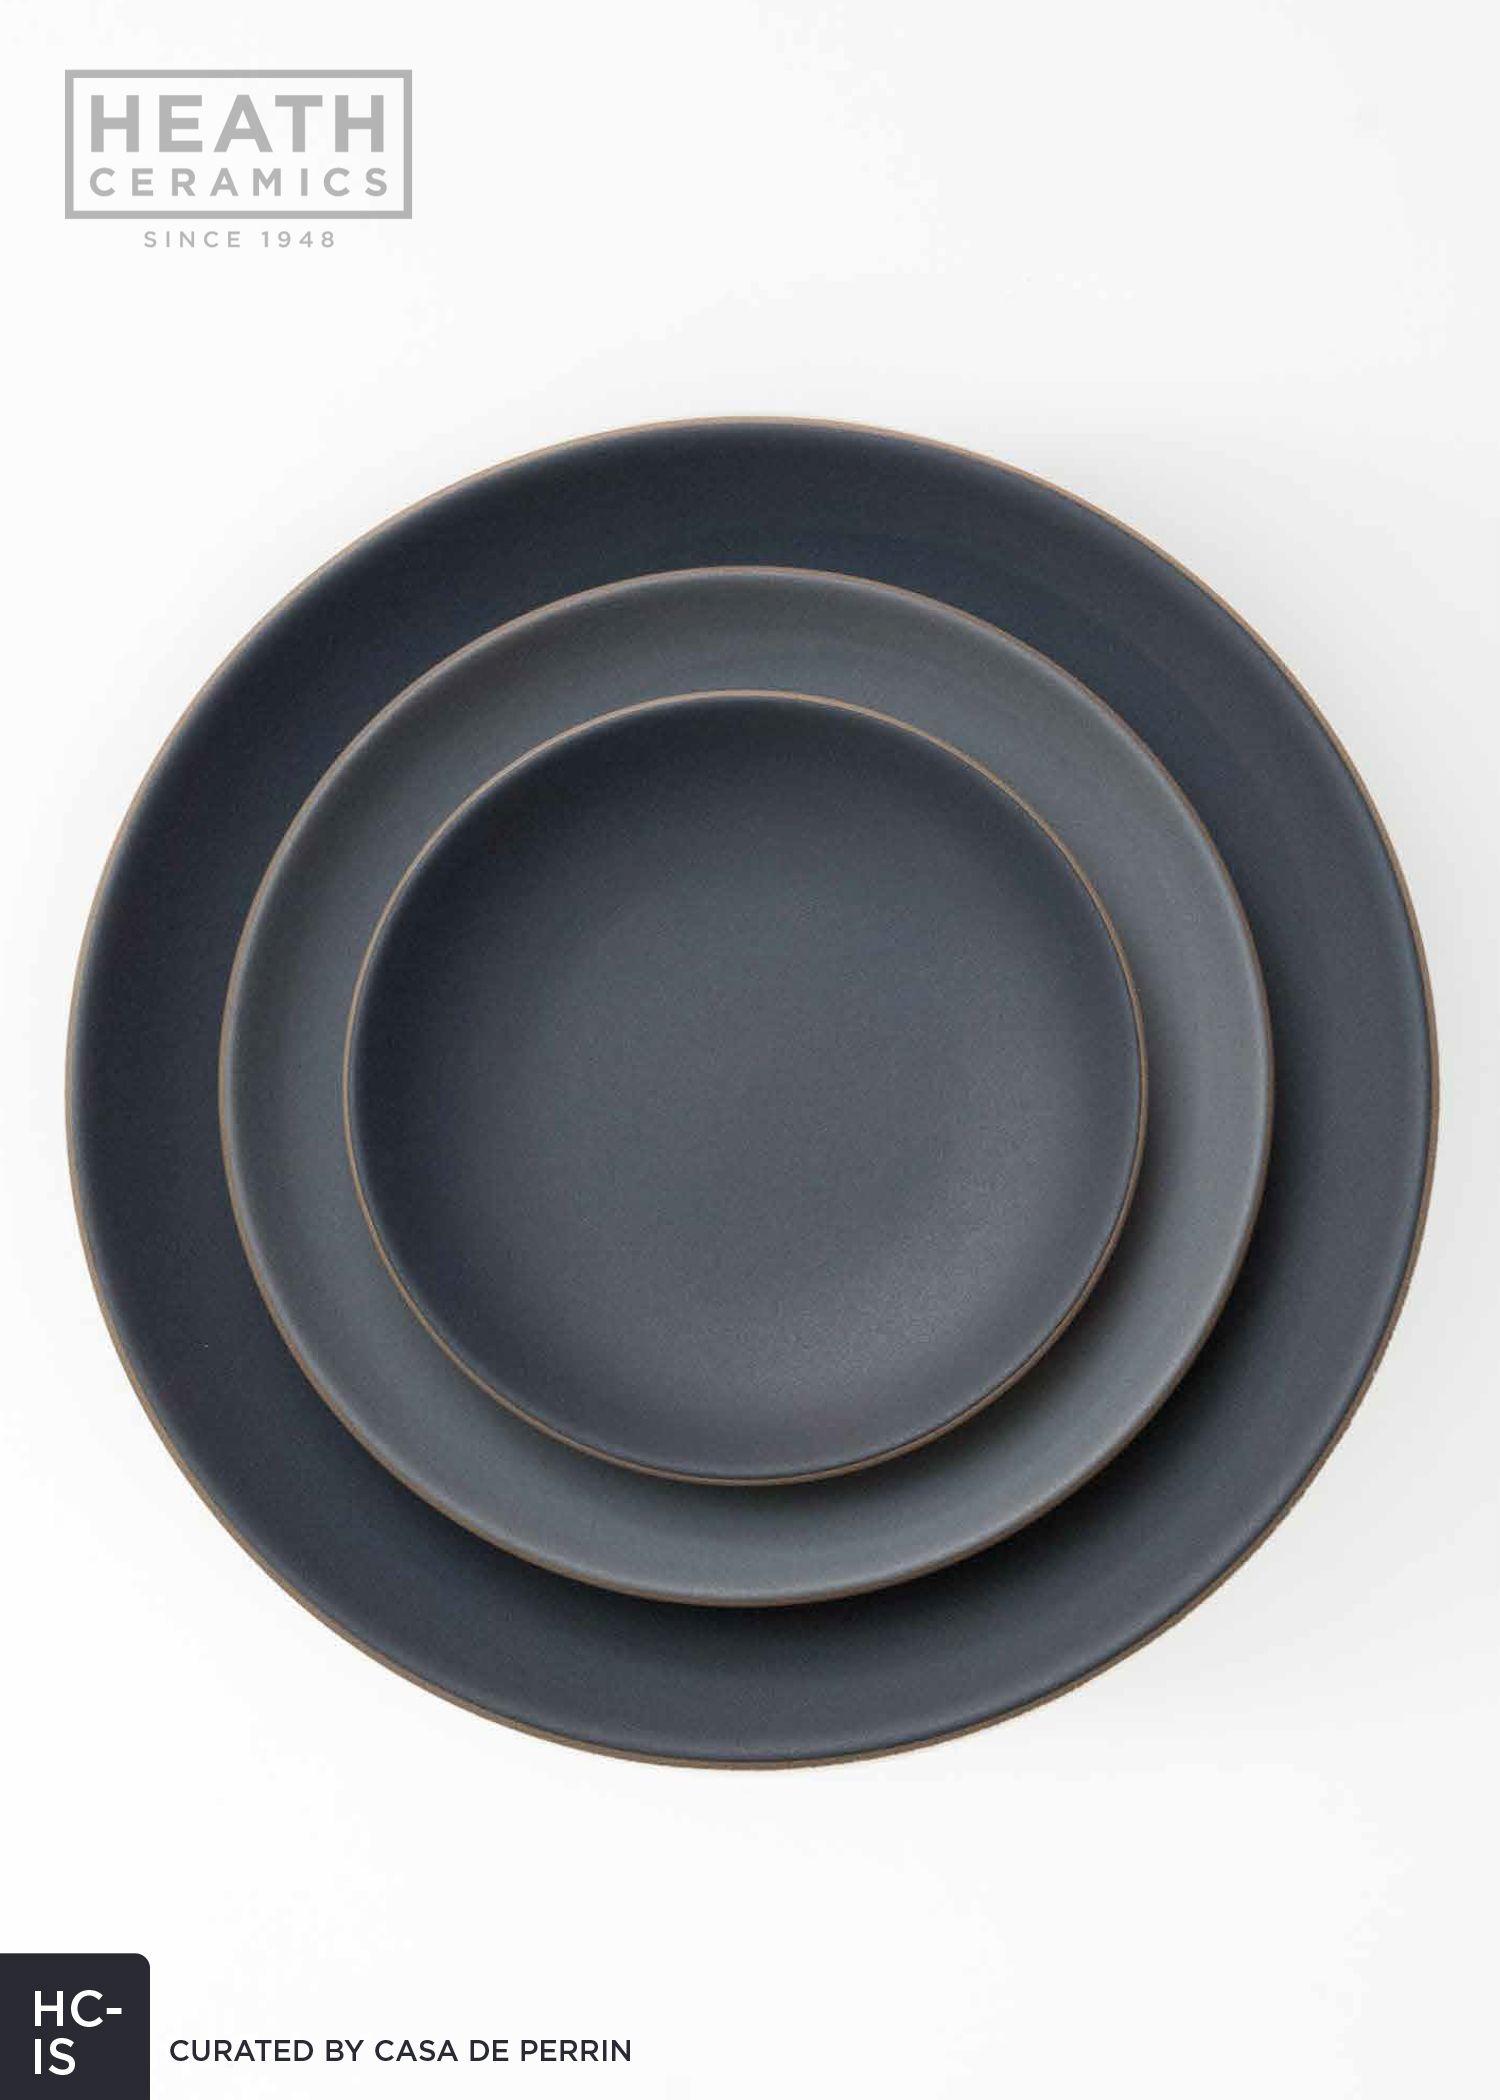 Heath Ceramics   Indigo/Slate - Dinner Plate Salad Plate Bread Plate /  sc 1 st  Pinterest & Heath Ceramics   Indigo/Slate - Dinner Plate Salad Plate Bread ...